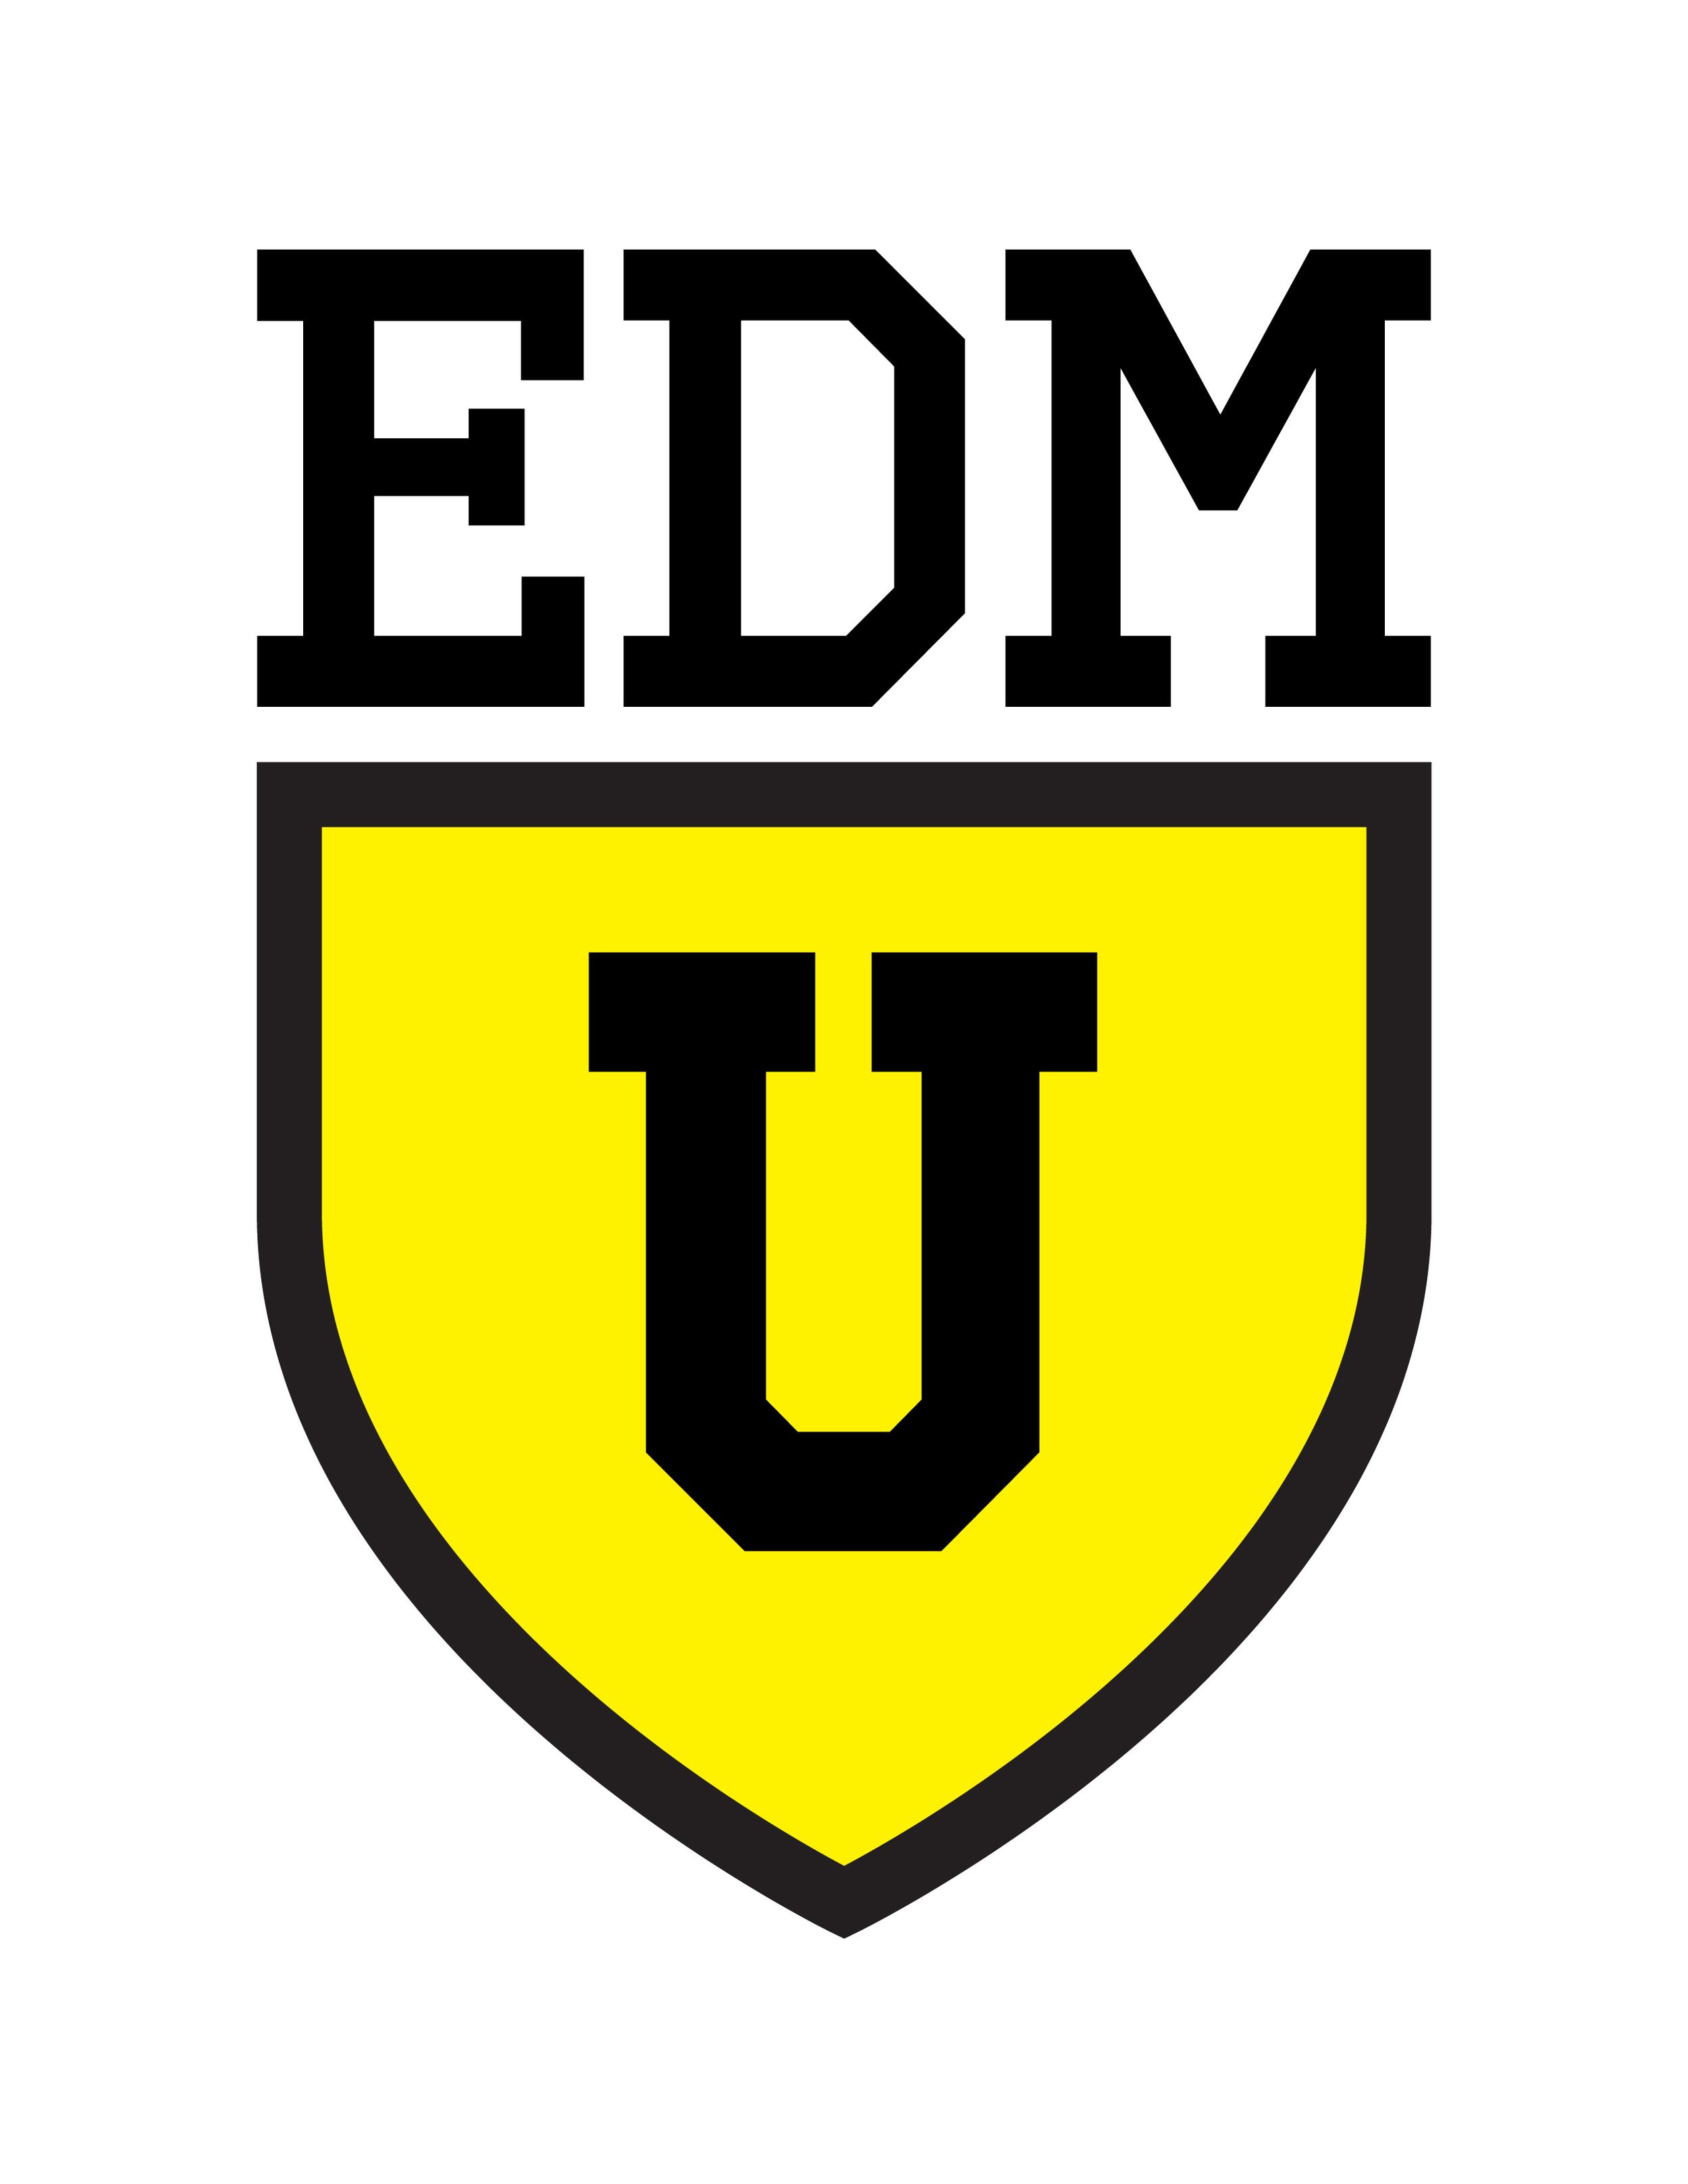 magnetic magazine - edm u